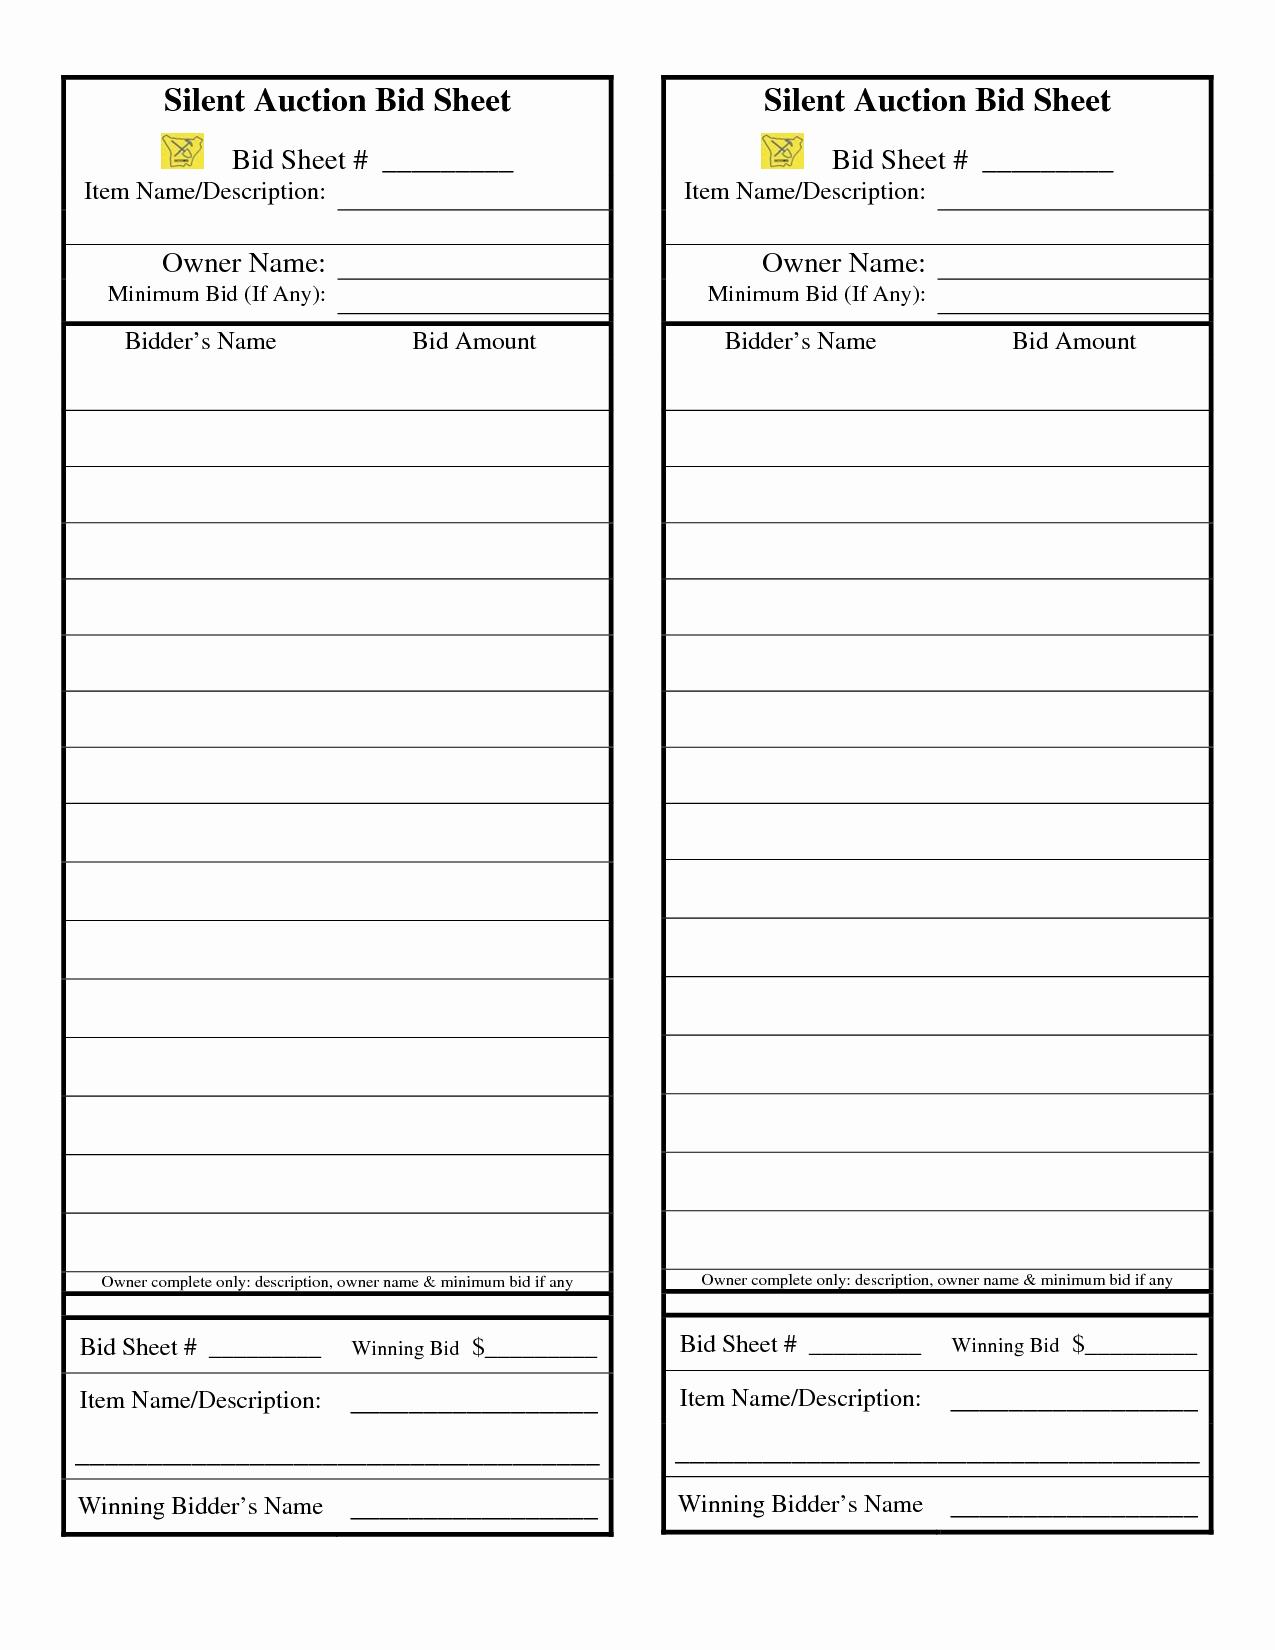 Auction Bid Sheet Template Beautiful Template for Silent Auction Bid Sheet